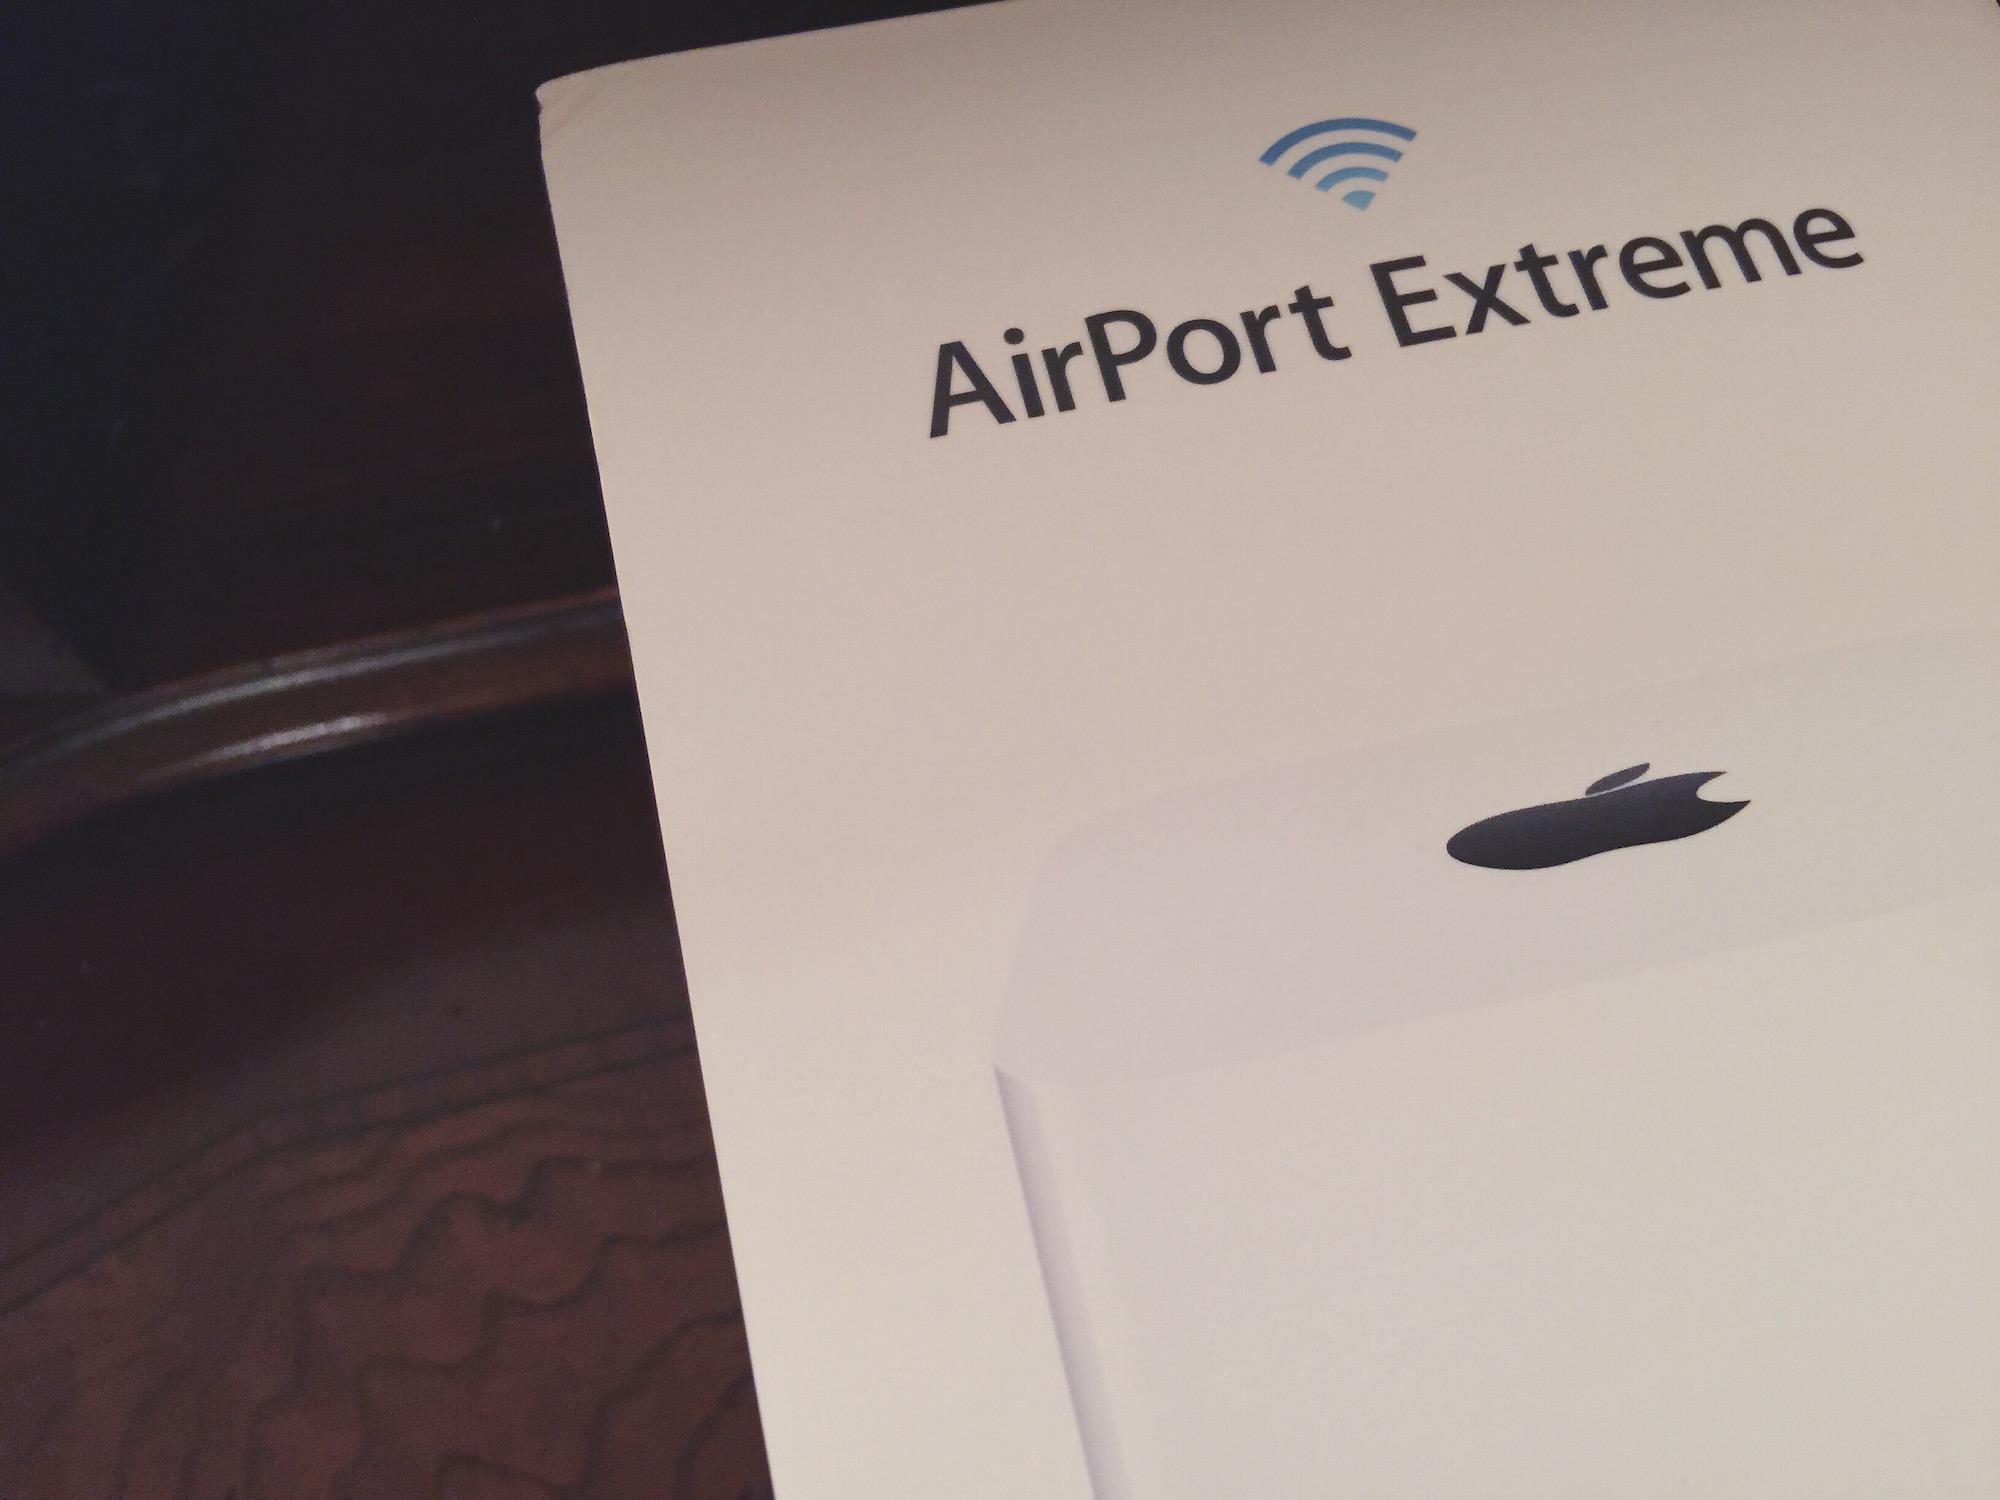 AirPort Extreme 01 hero